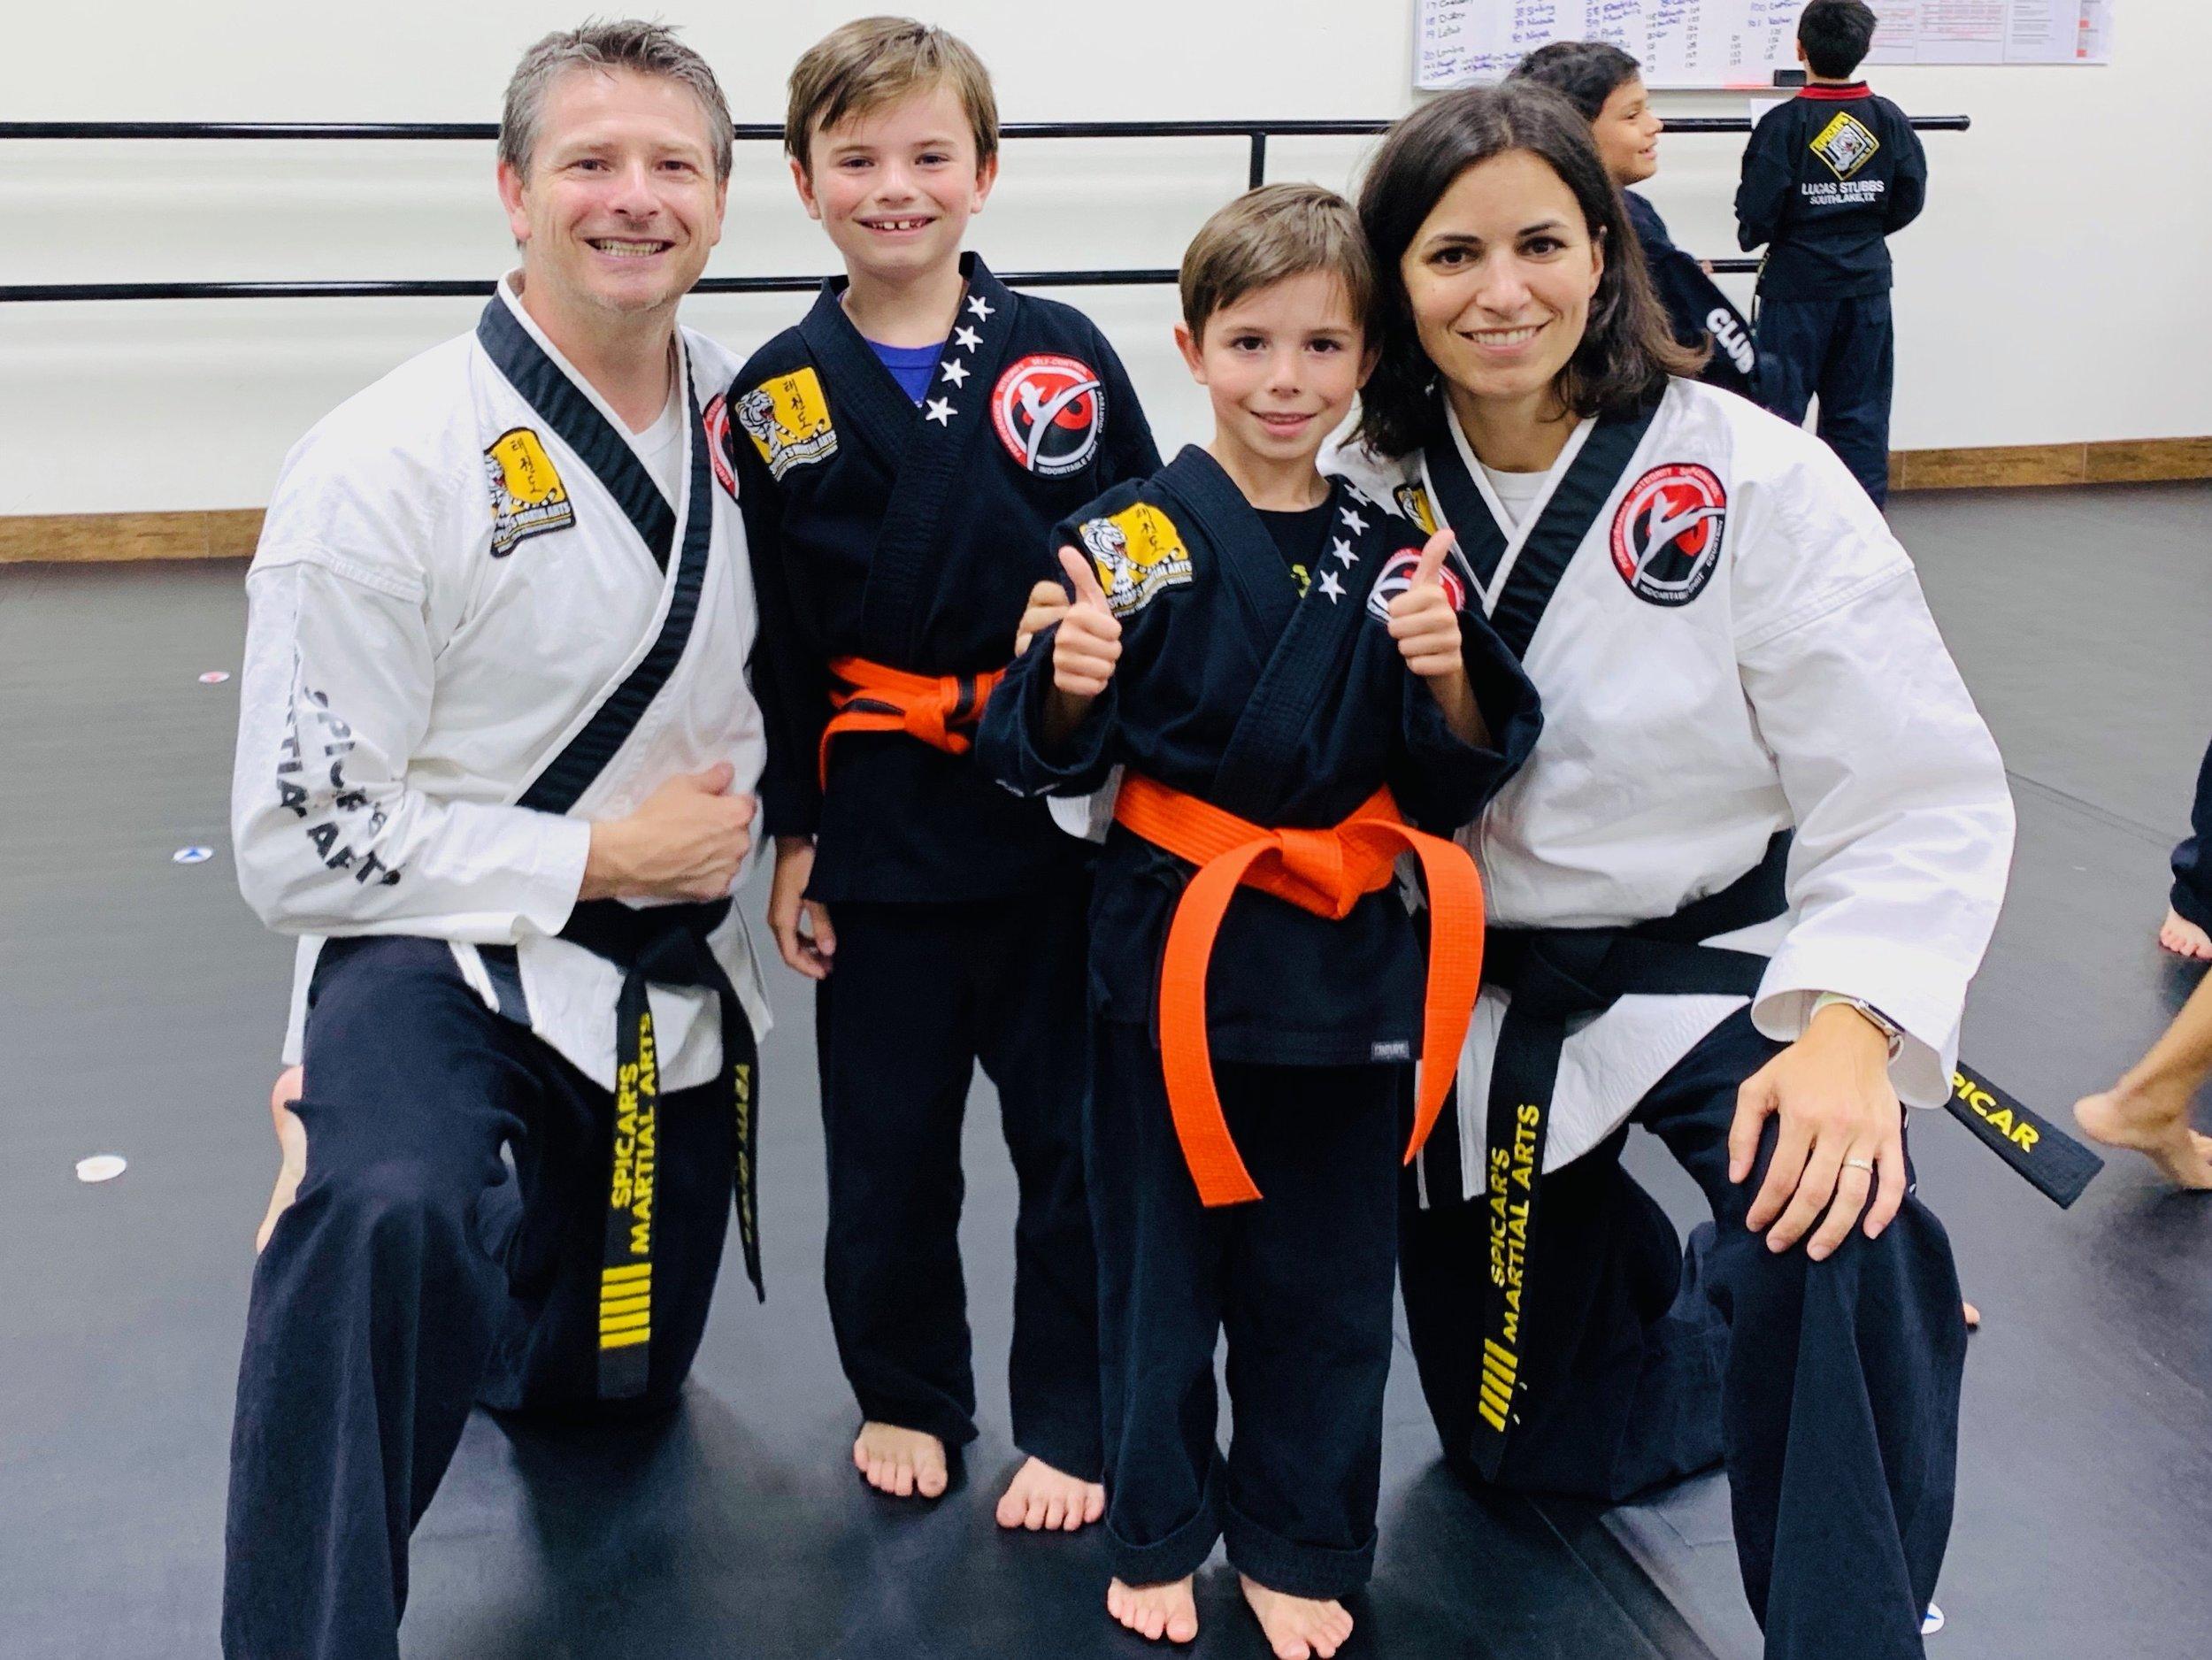 karate-kids-program-souhtlake-keller-grapevine-texas00001.jpeg